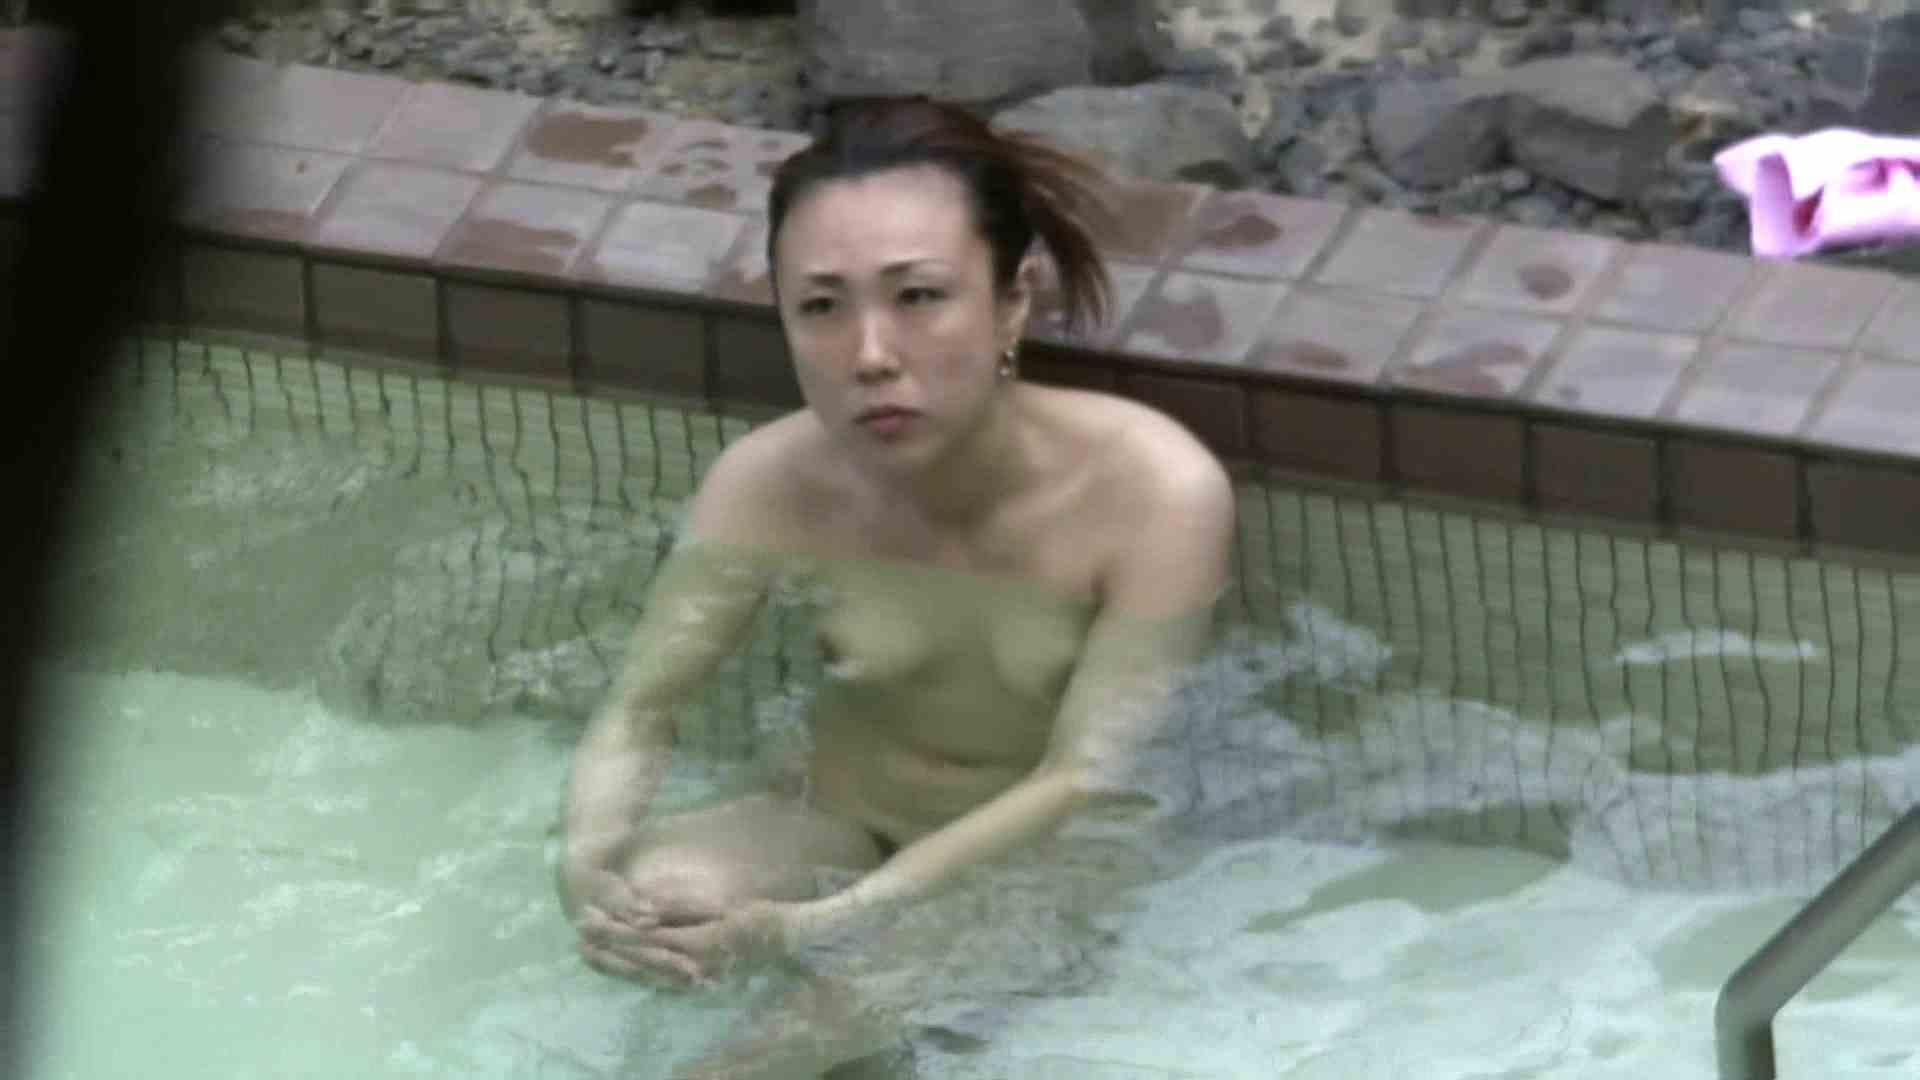 Aquaな露天風呂Vol.654 女体盗撮   OL女体  87連発 55